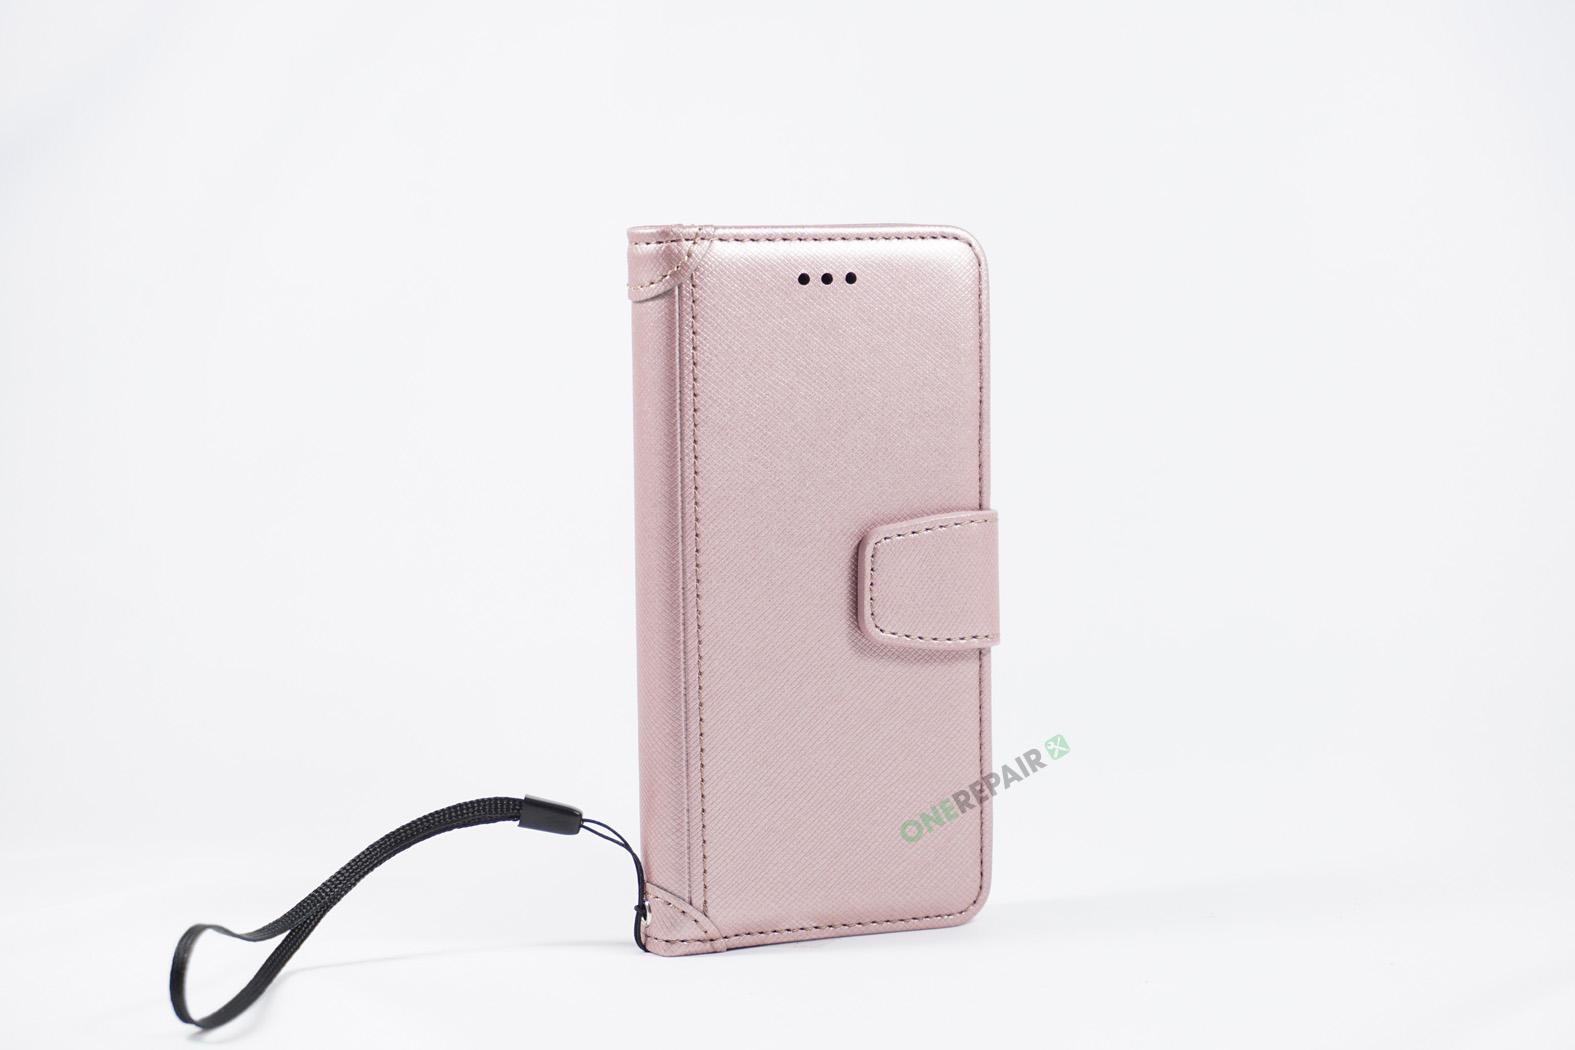 350788_iPhone_7_8_Luxury_Flipcover_Cover_Lyseroed_Pink_OneRepair_WM_00004